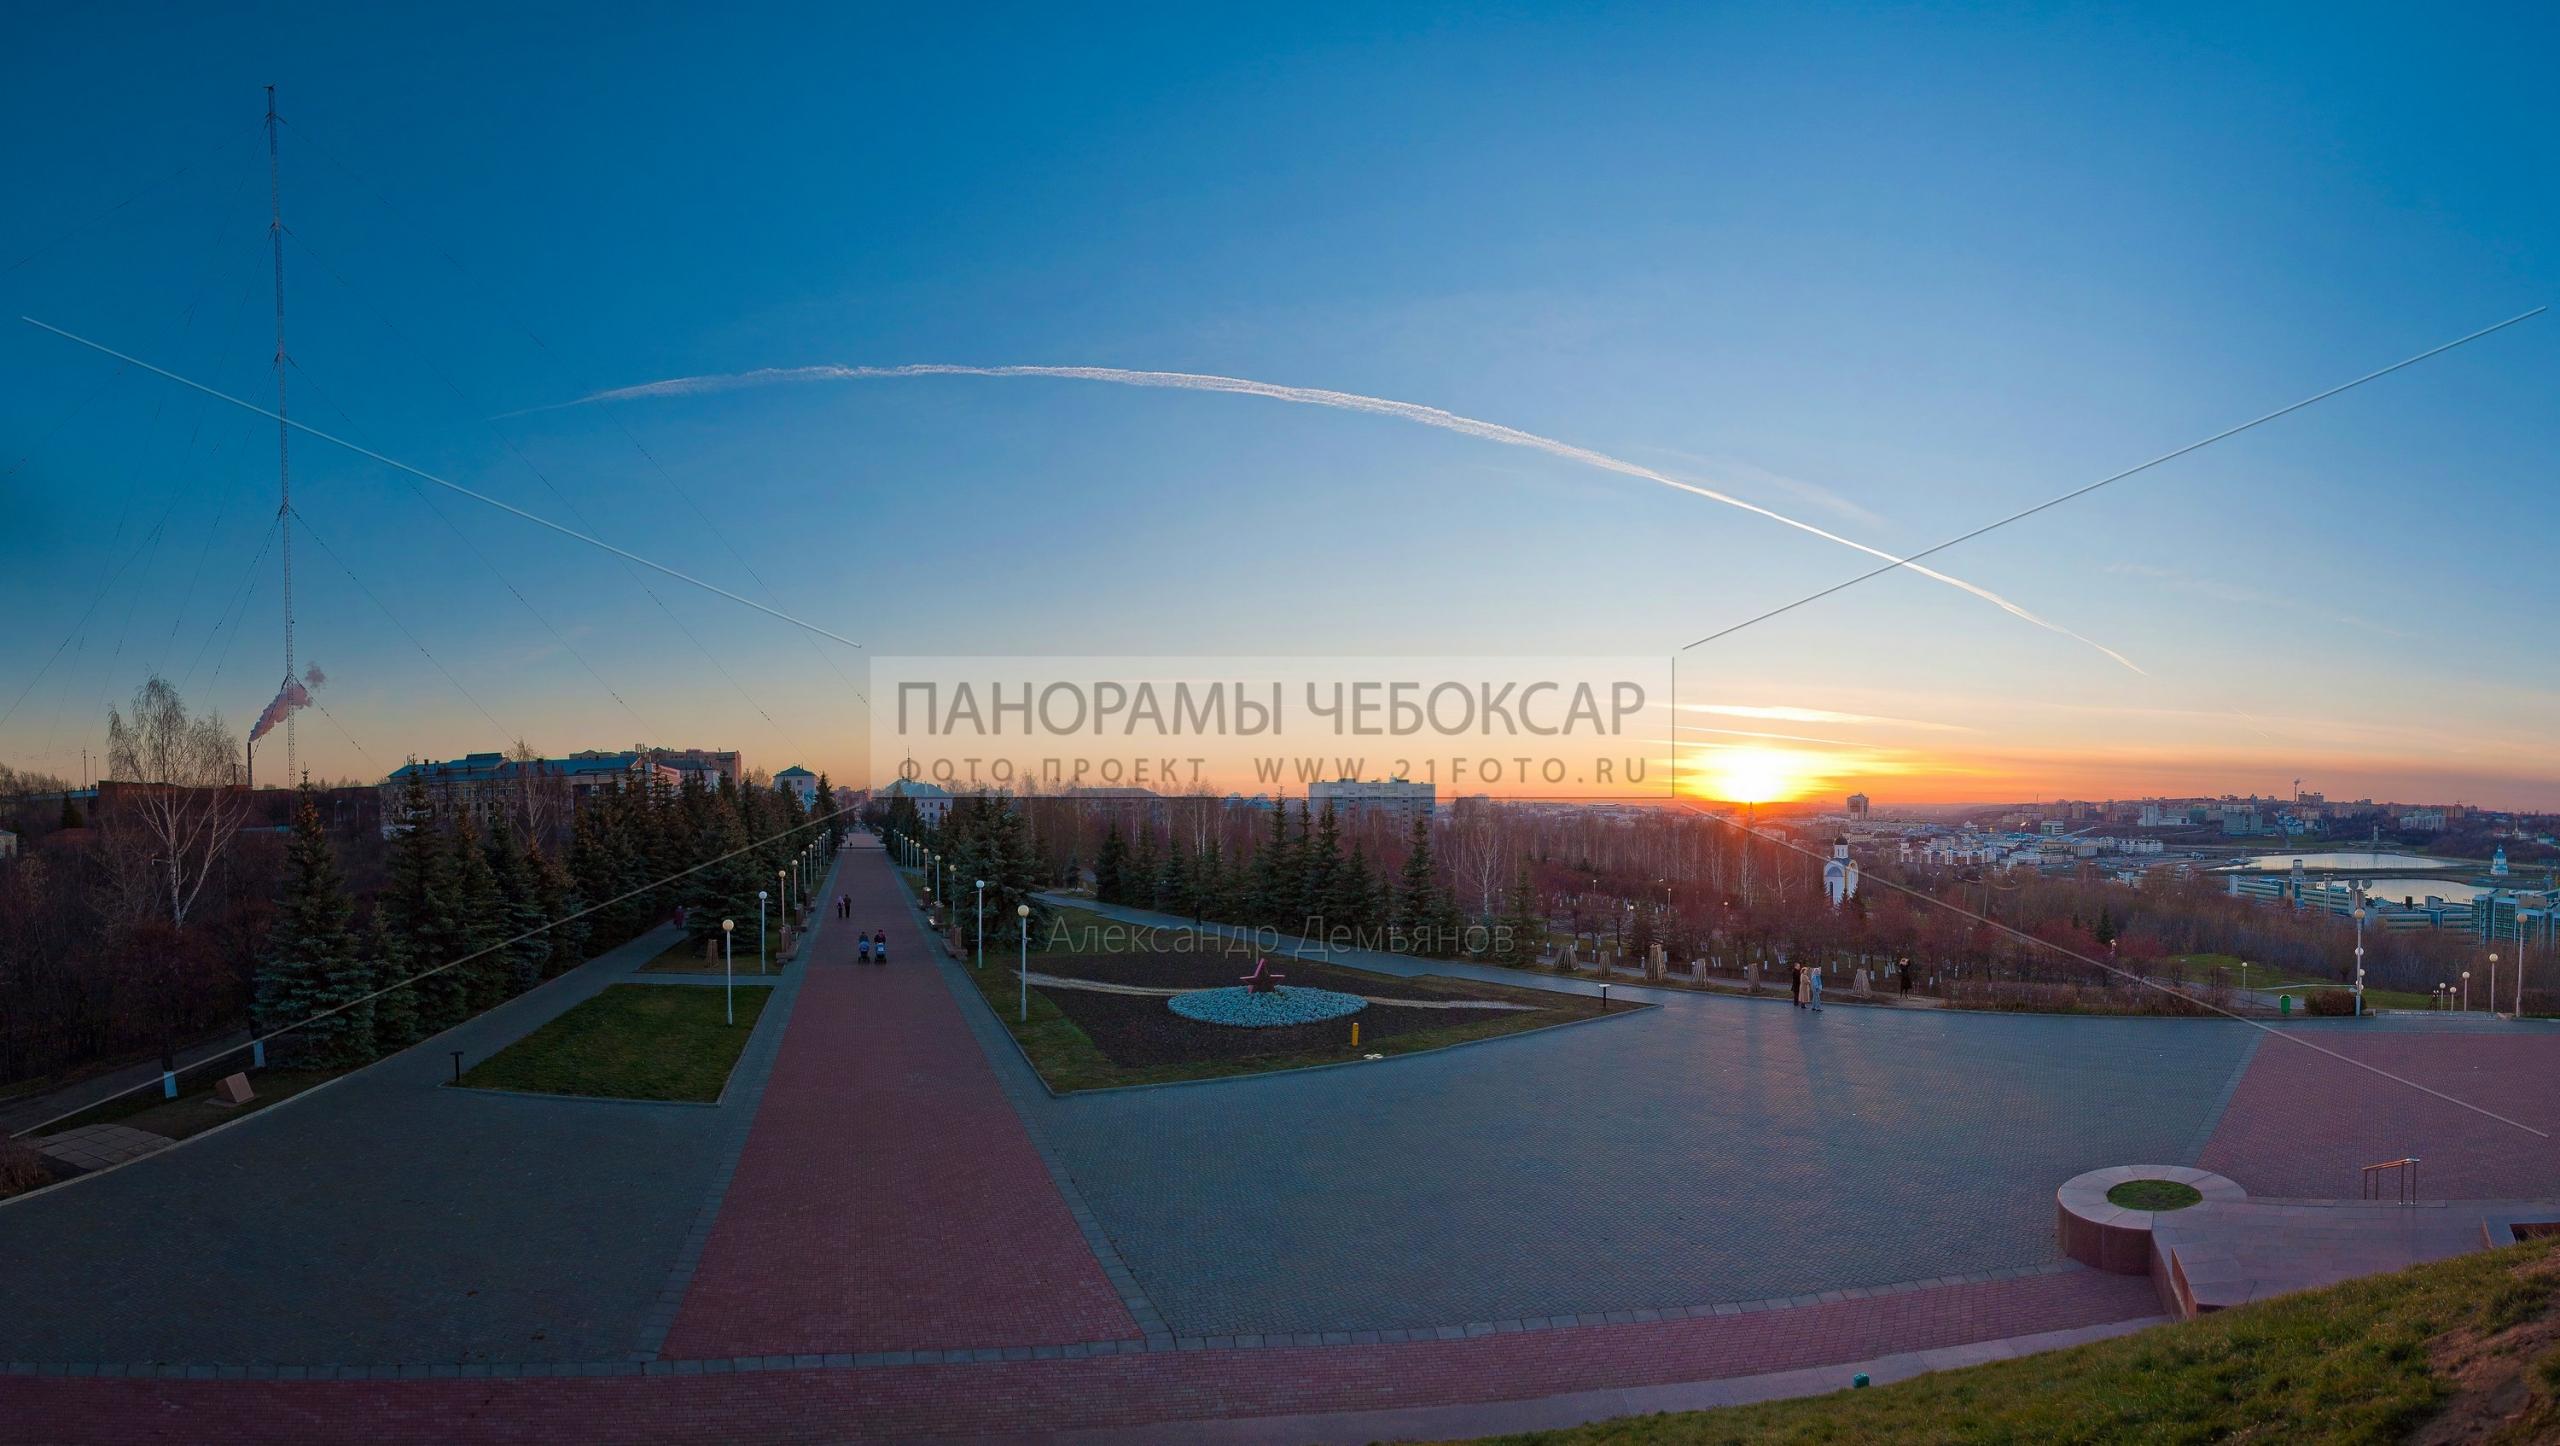 Фото панорама Чебоксарской аллеи славы на закате, вид с памятника победы